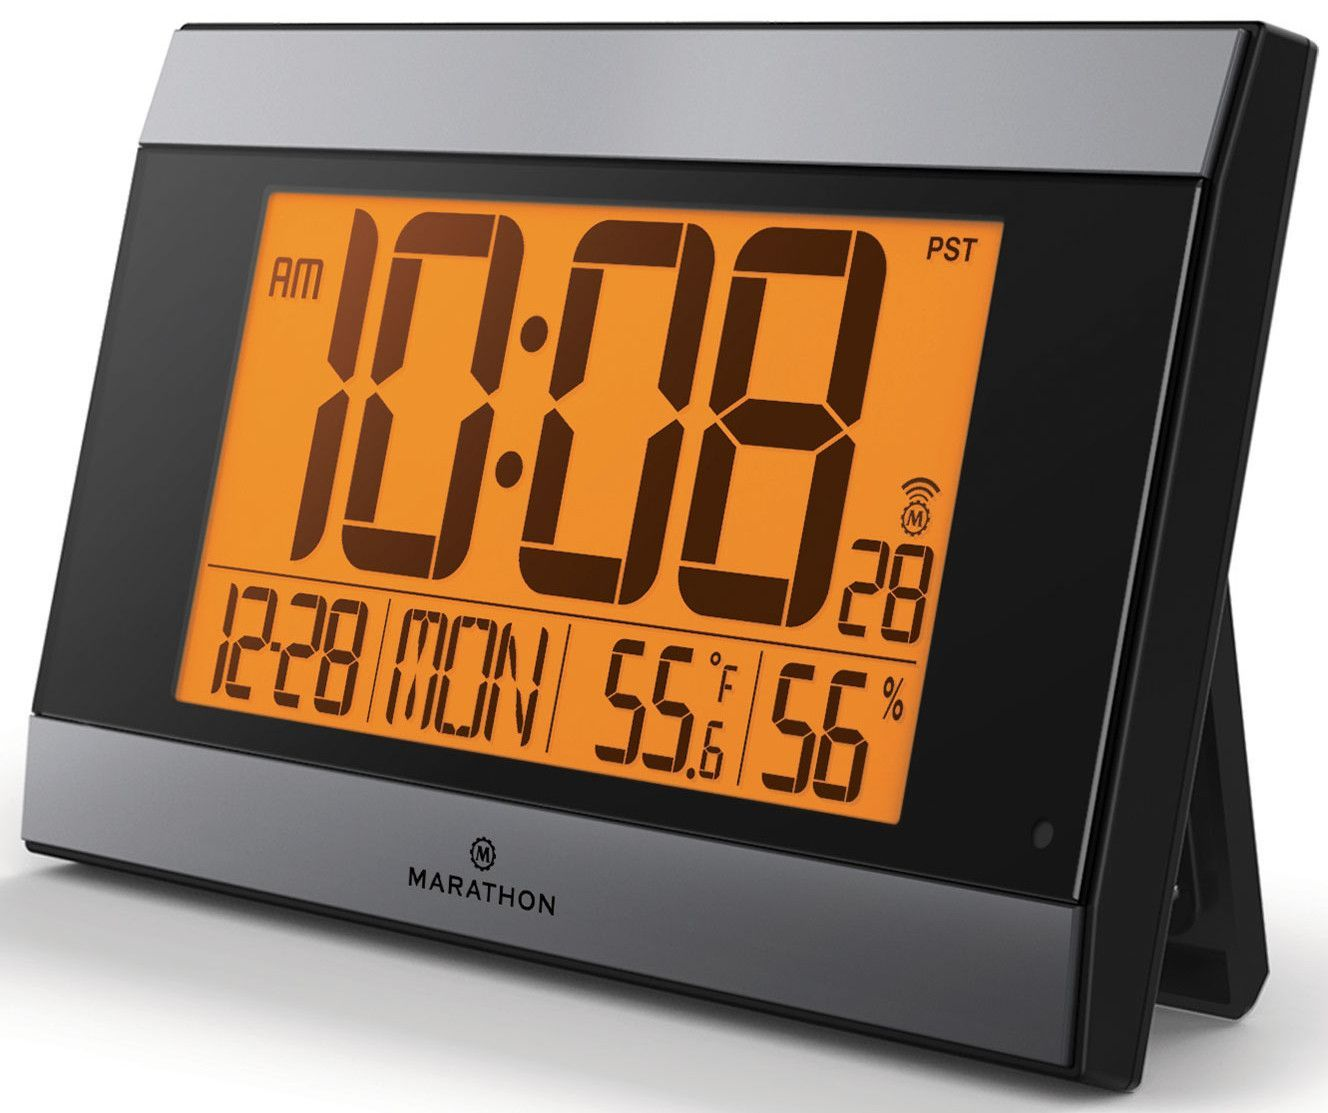 Atomic Digital Wall Clock With Auto-Night Light, Temperature